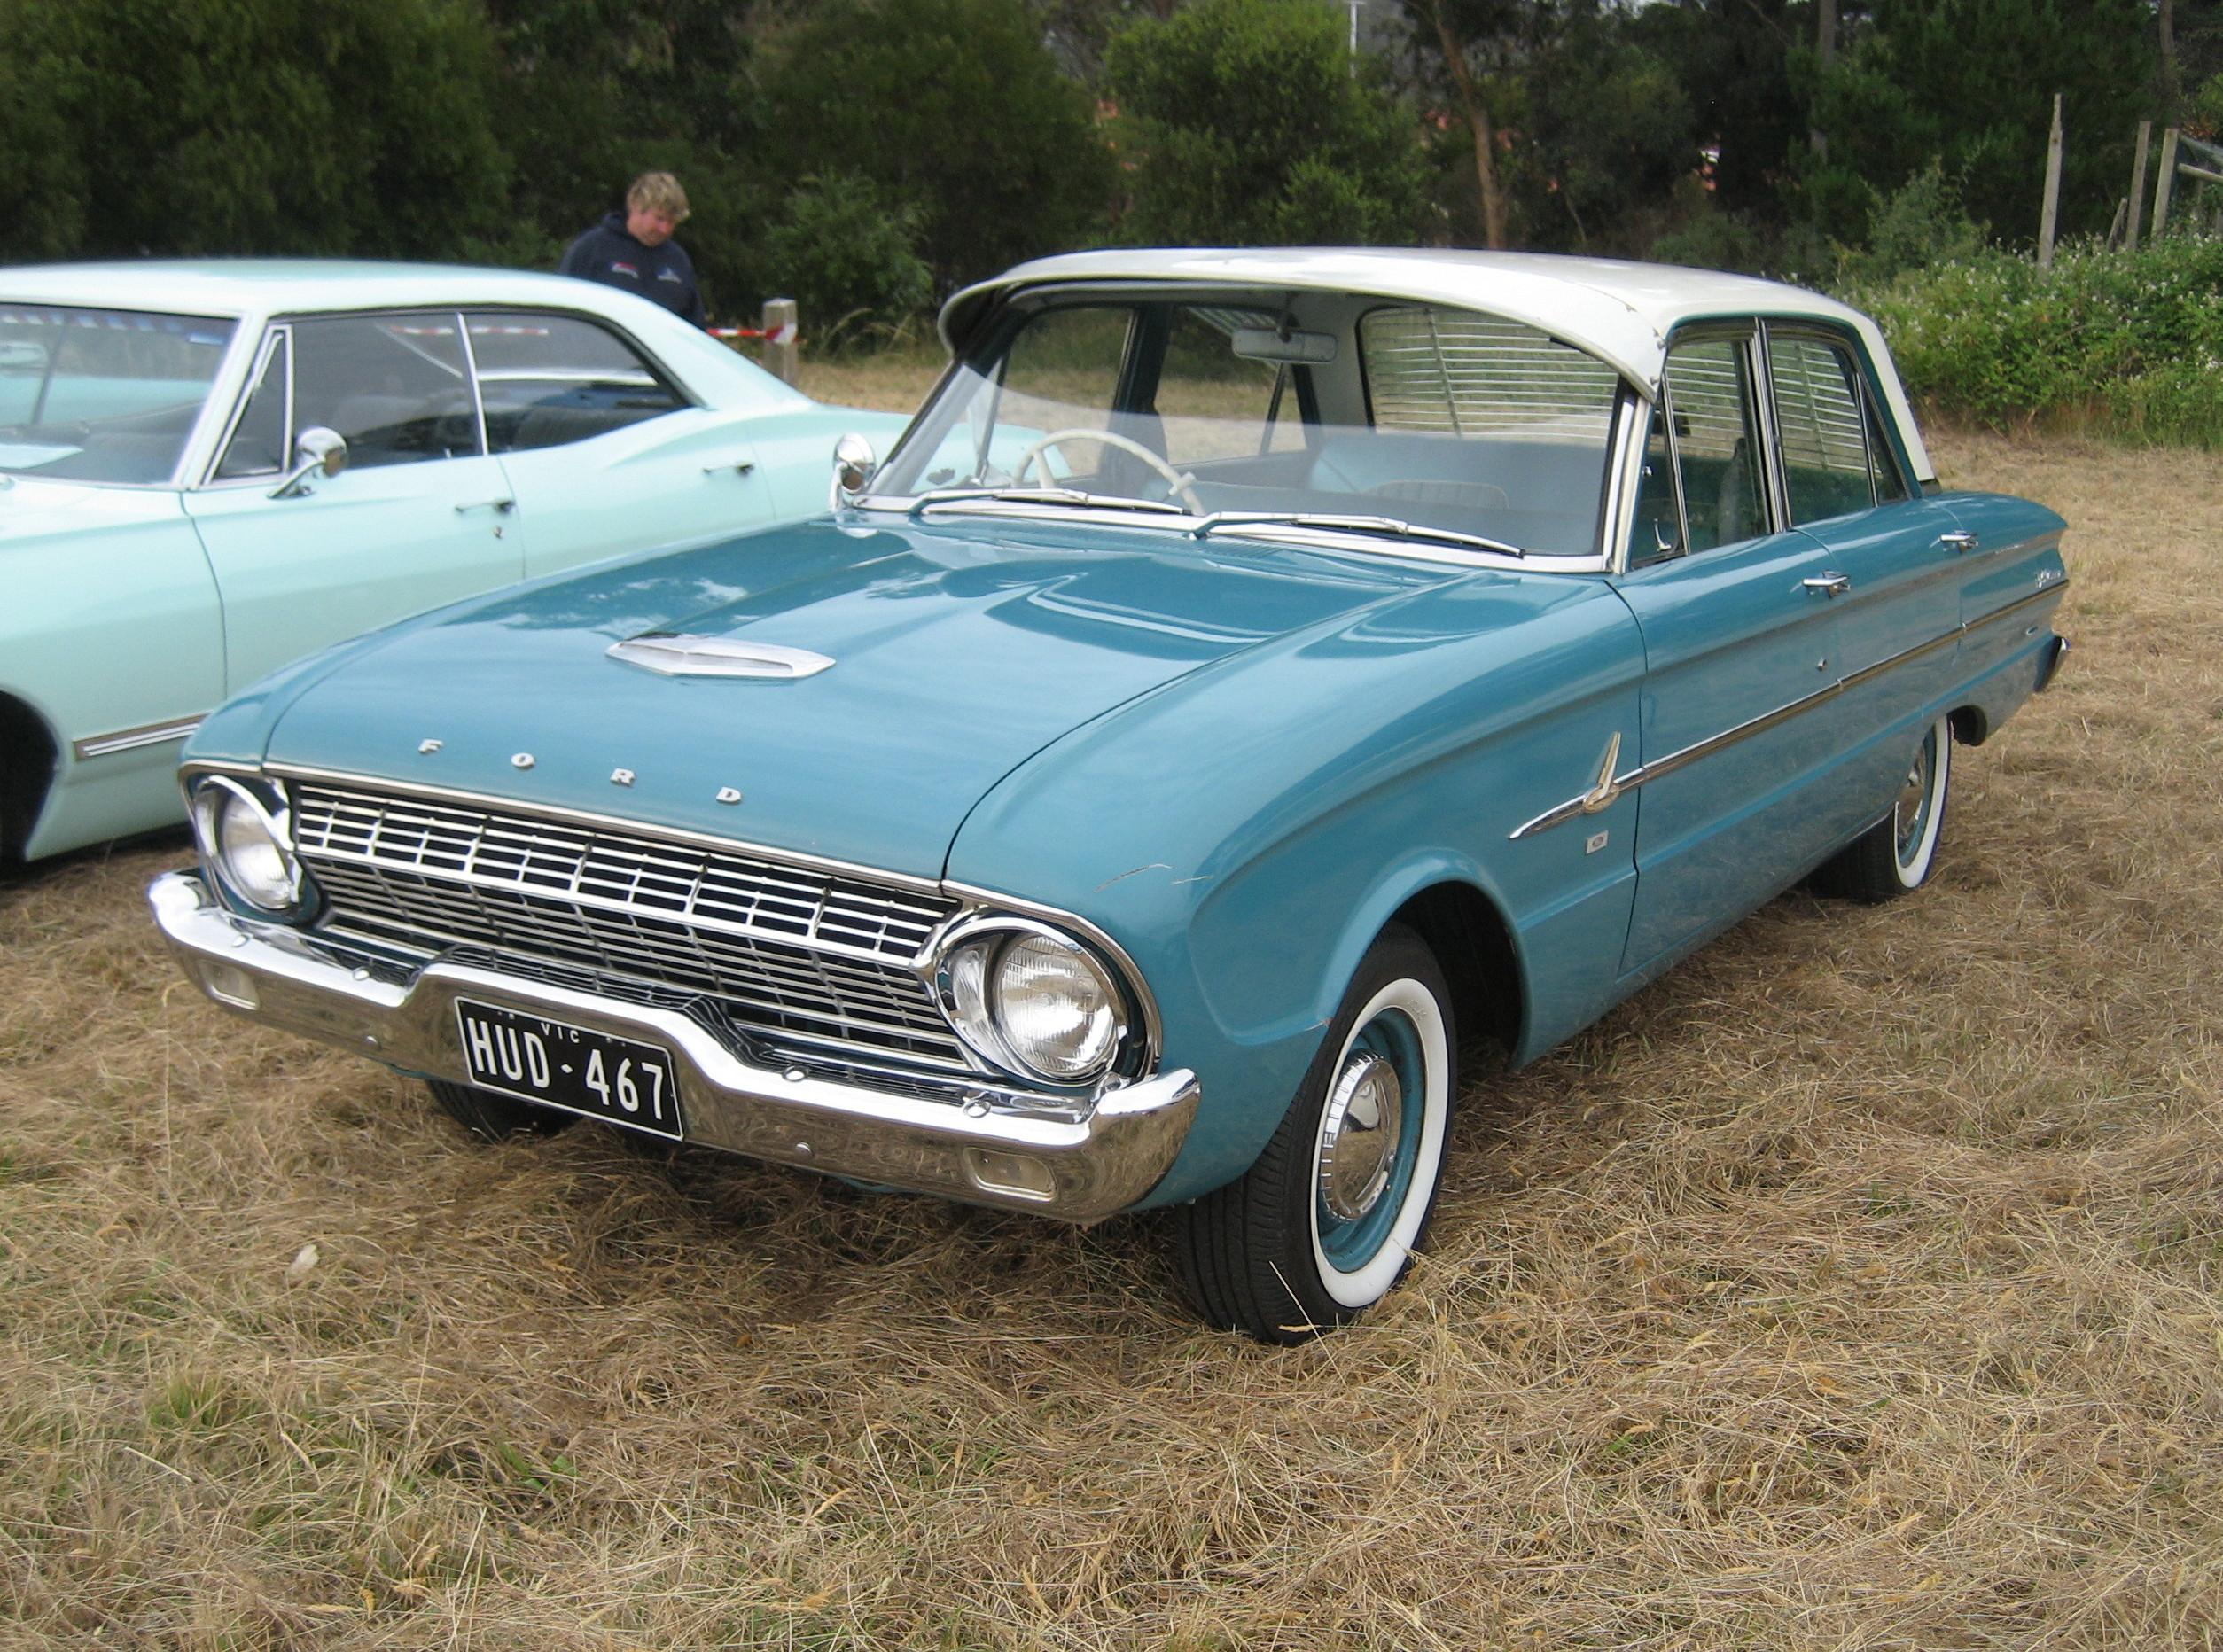 1964 ford falcon 4 door find used 1964 ford falcon 4 door 170 special - 1964 Ford Falcon 4 Door Find Used 1964 Ford Falcon 4 Door 170 Special 13